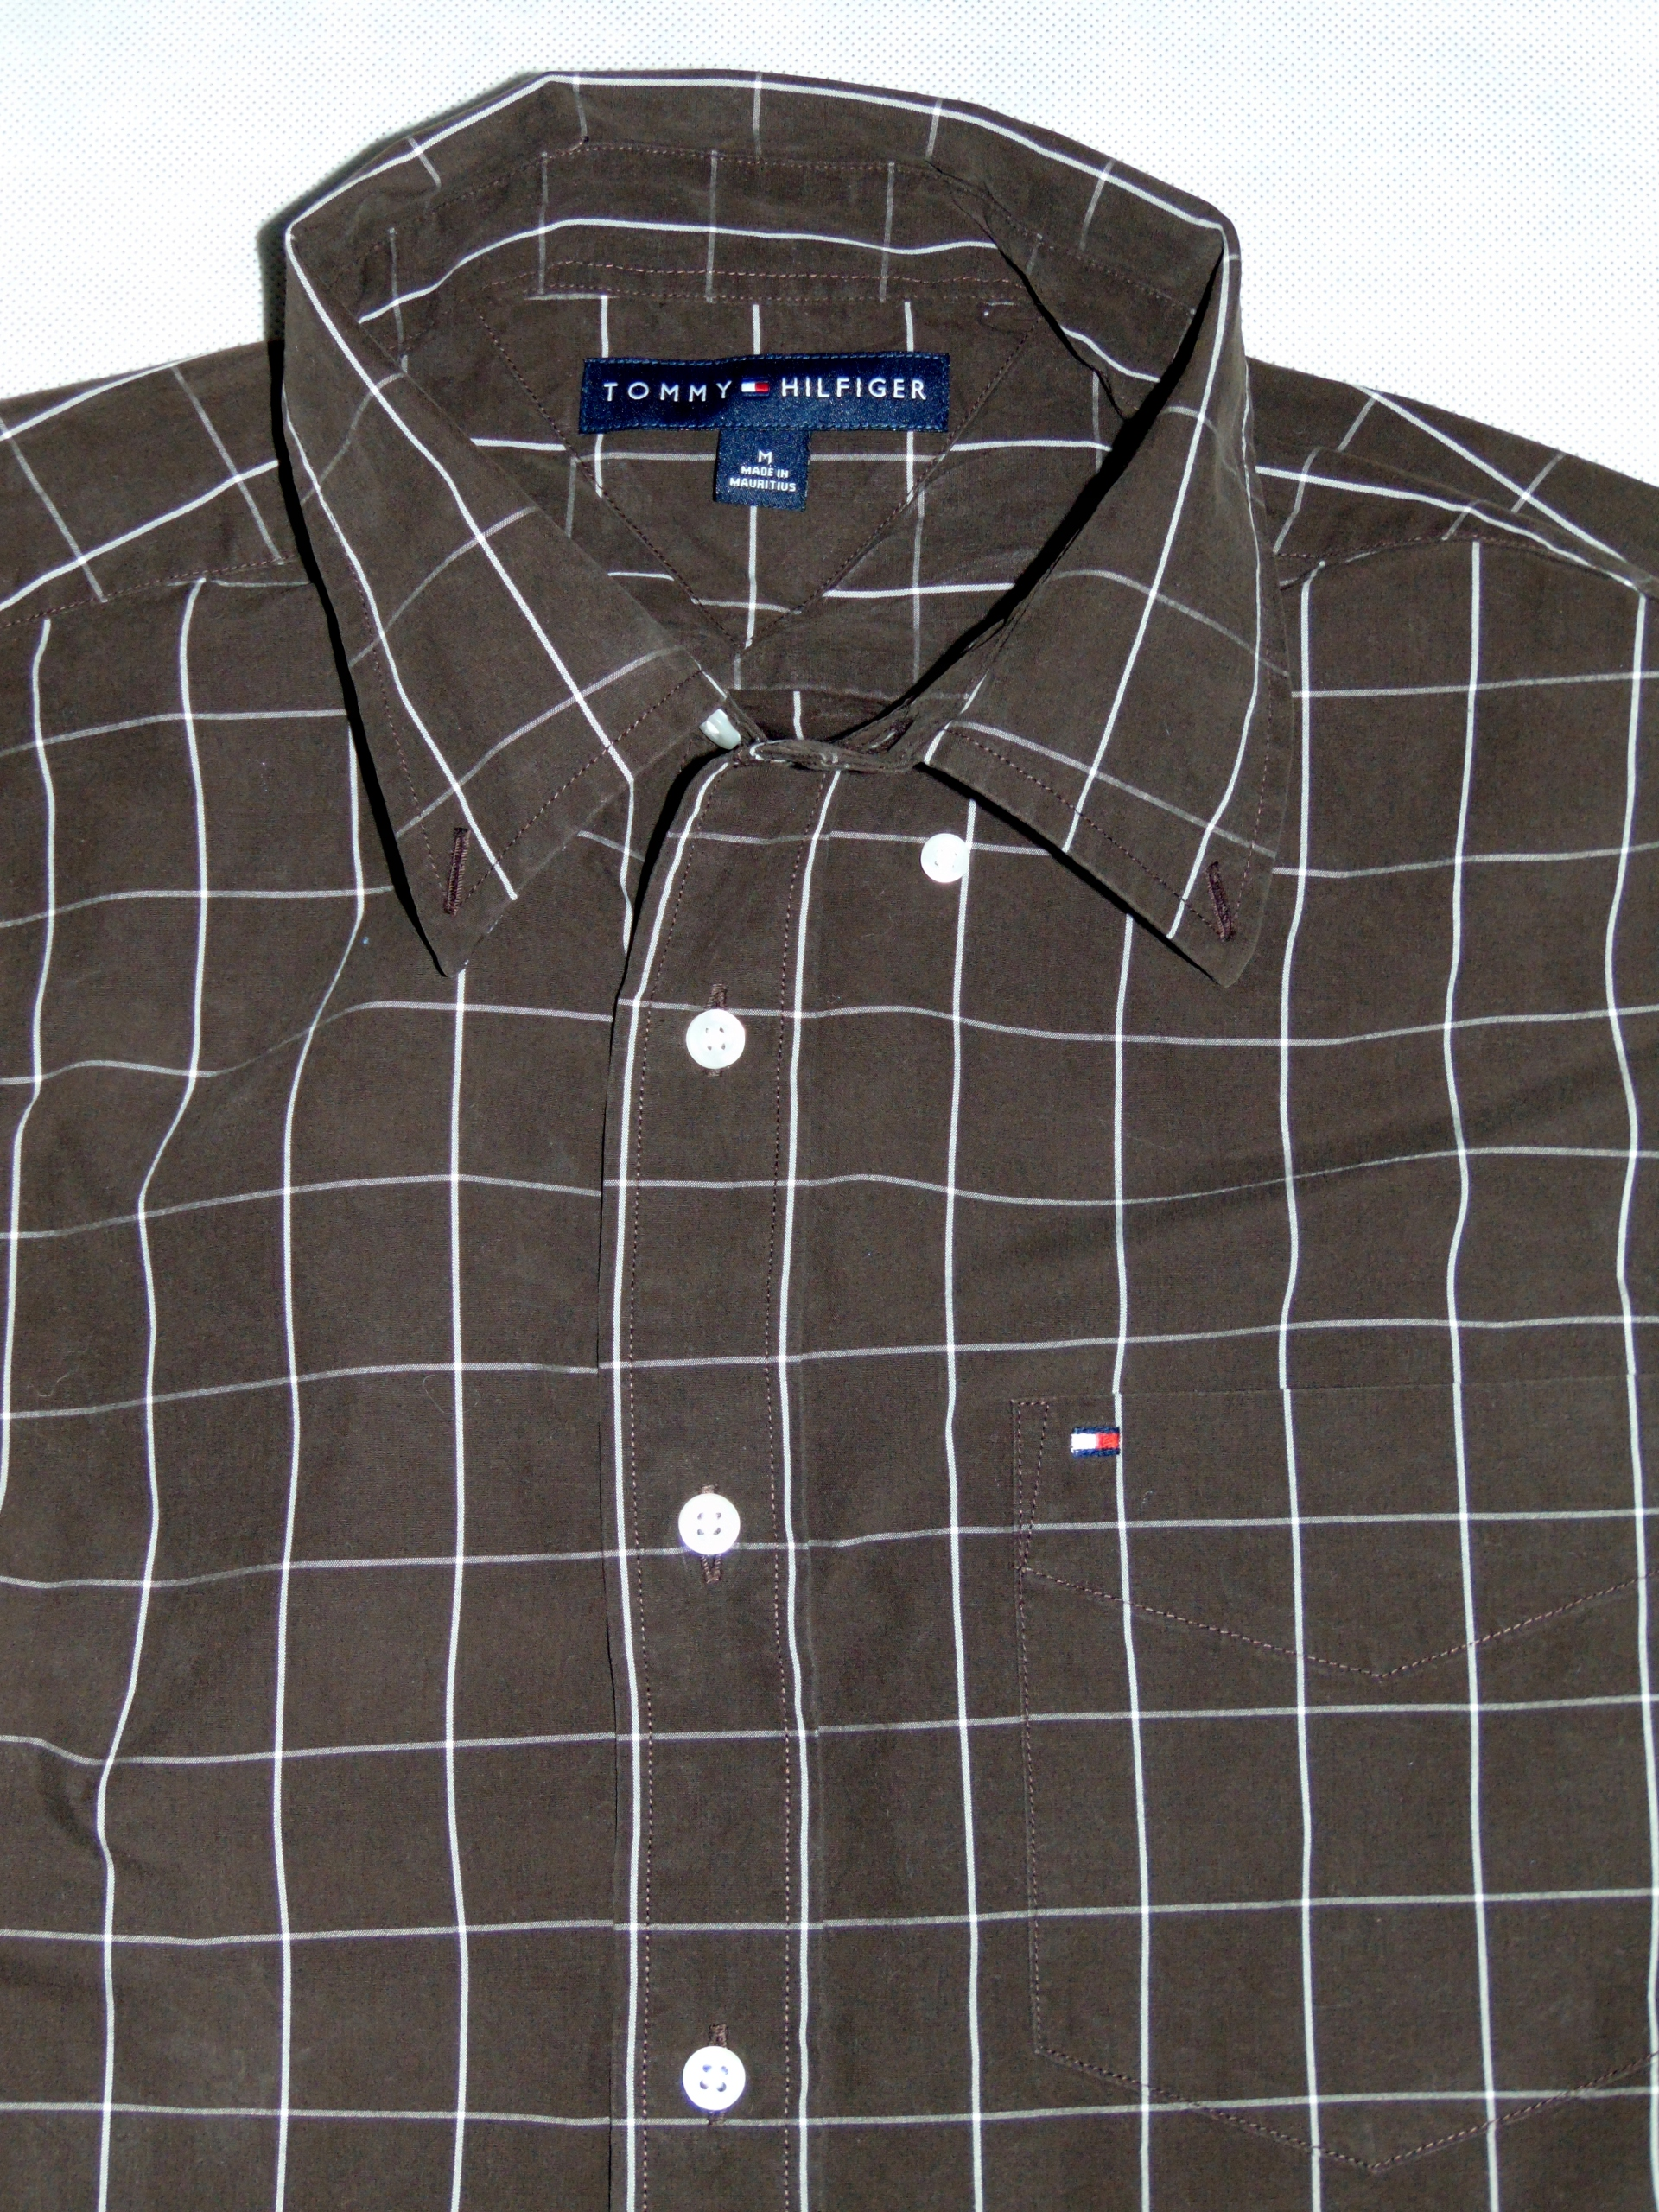 04a314f52 TOMMY HILFIGER koszula męska z kieszonką r M - 7630974965 ...